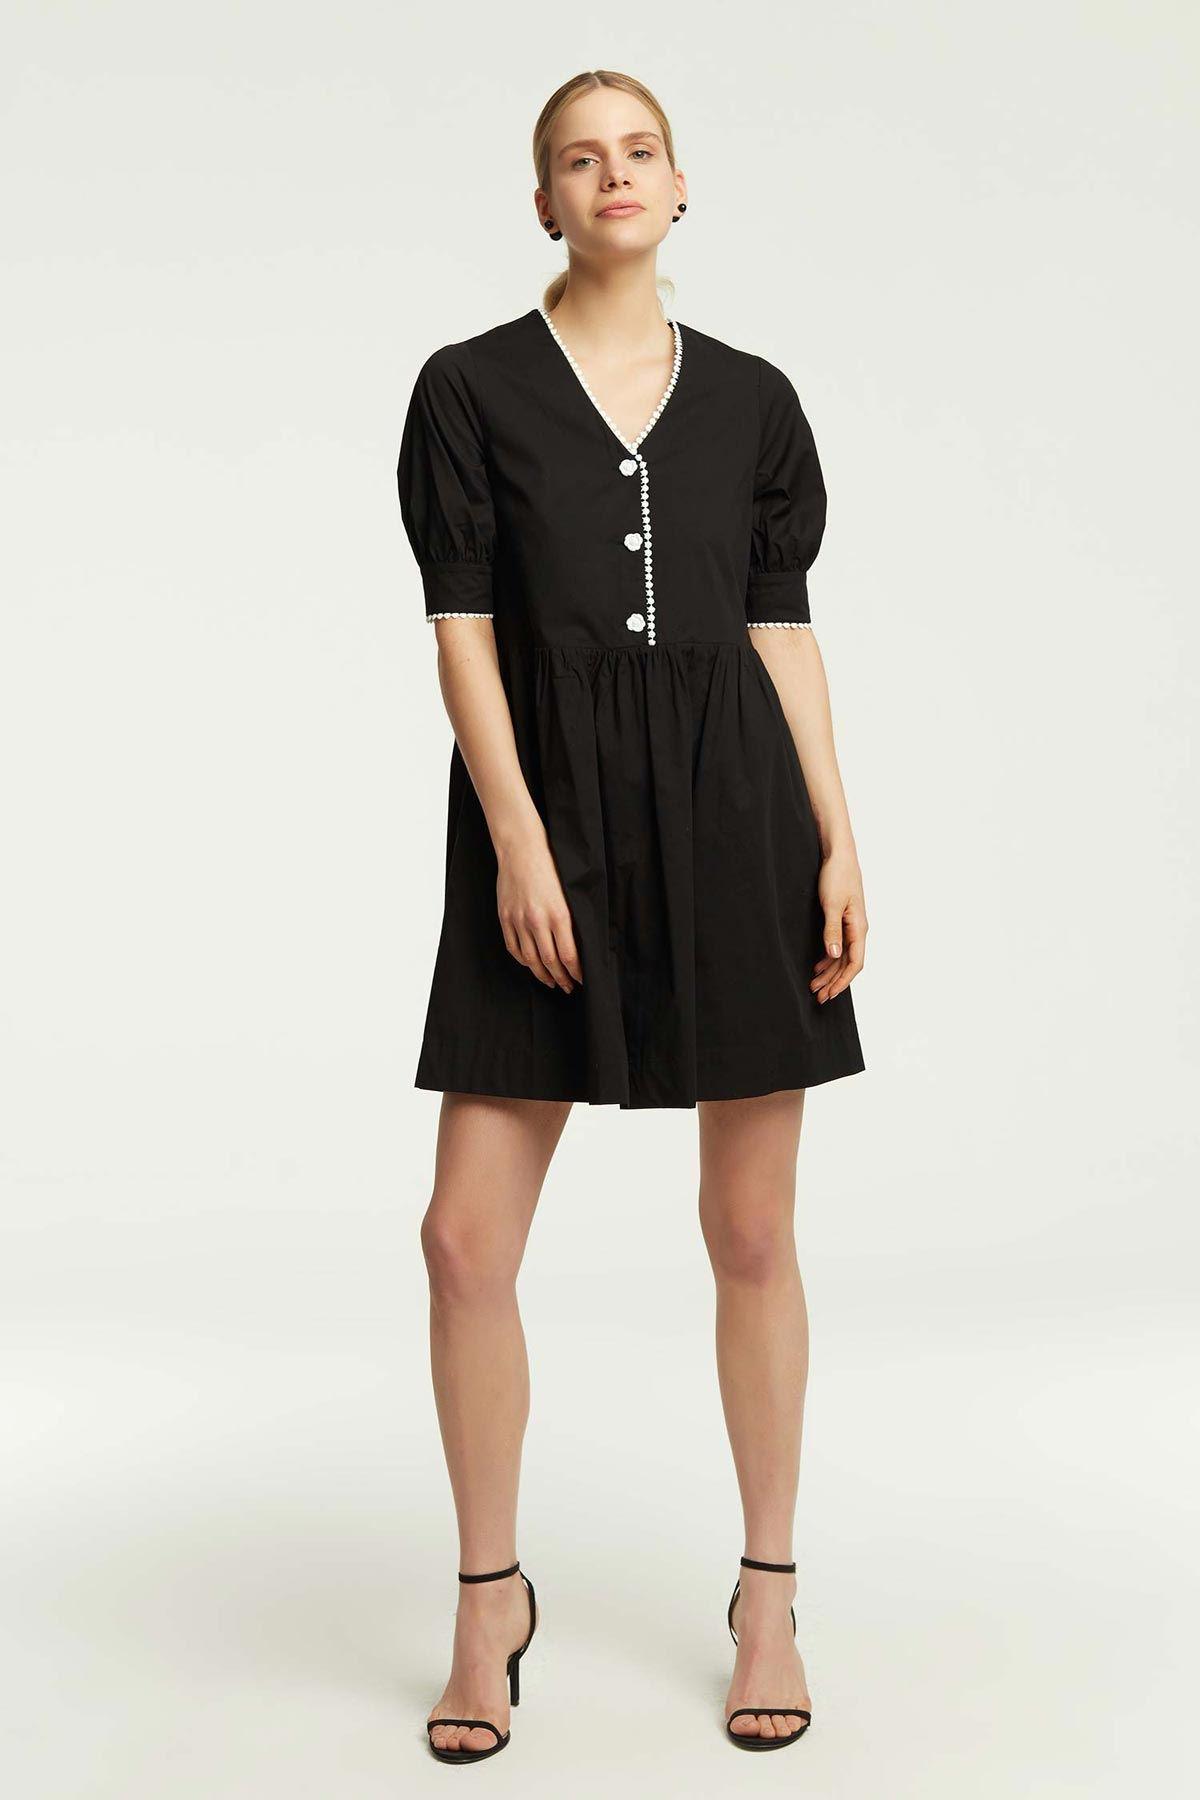 Şerit Geçişli Elbise Siyah